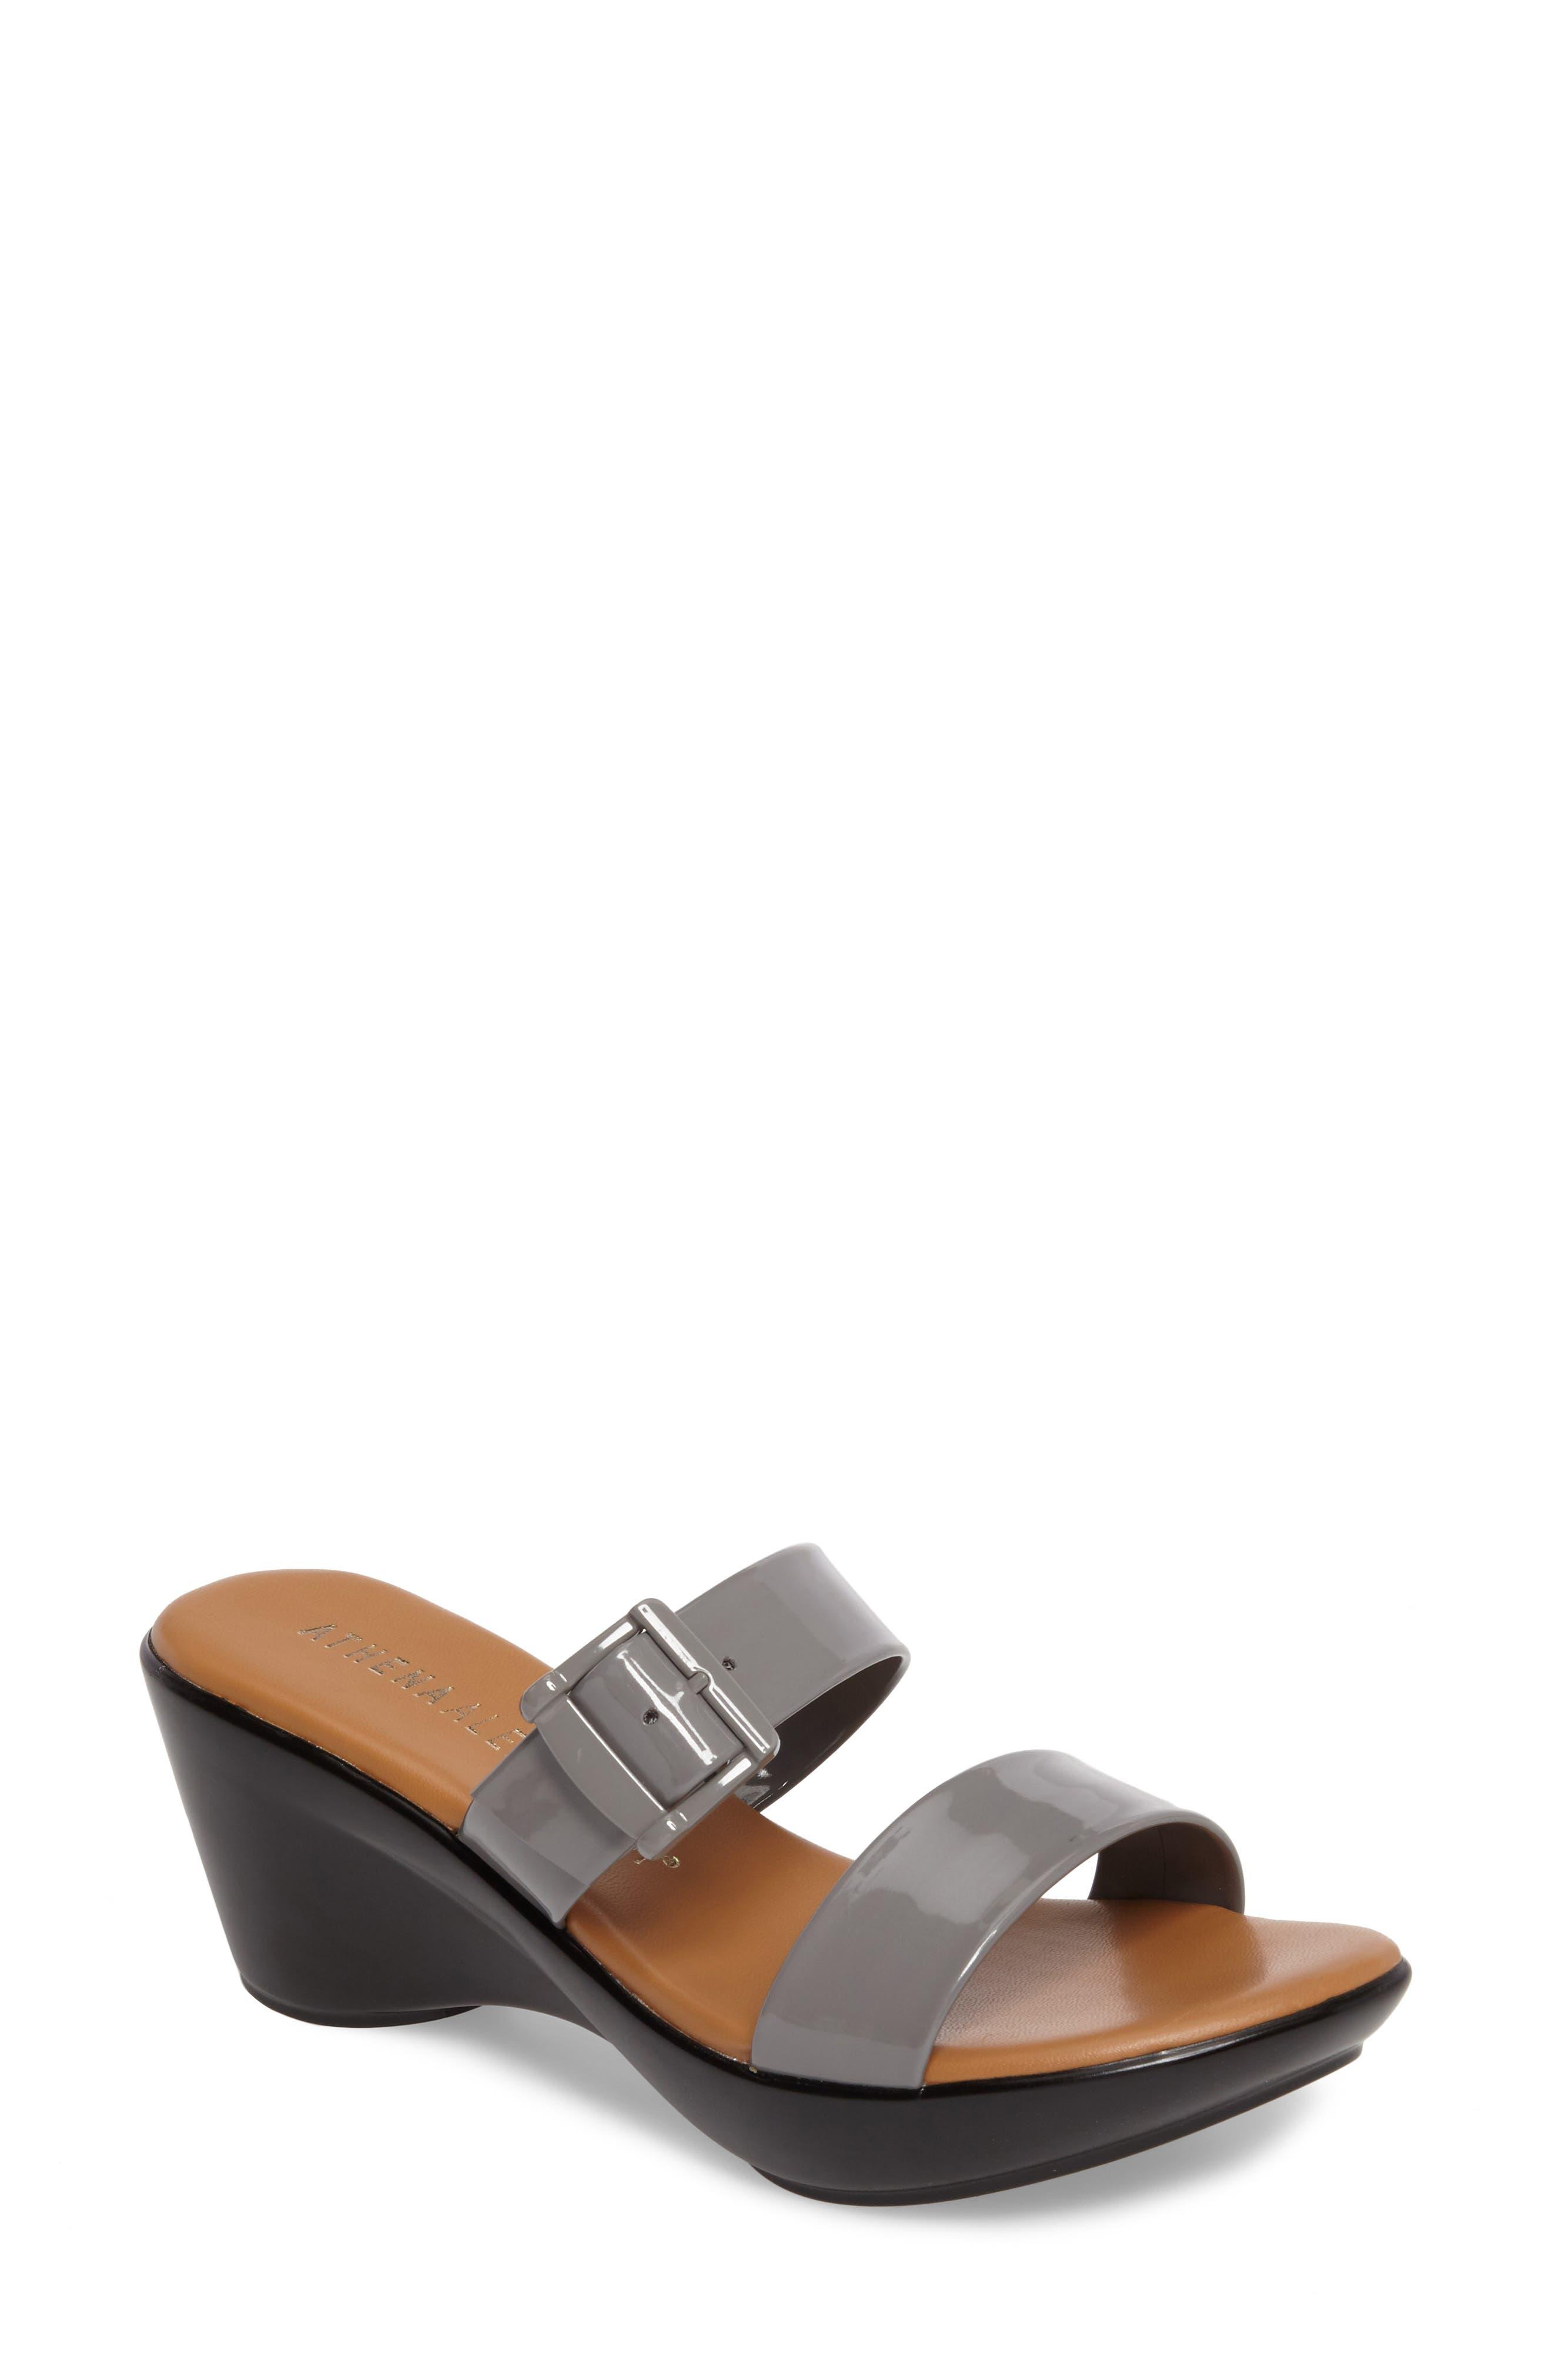 Athena Alexander Darlling Wedge Sandal (Women)